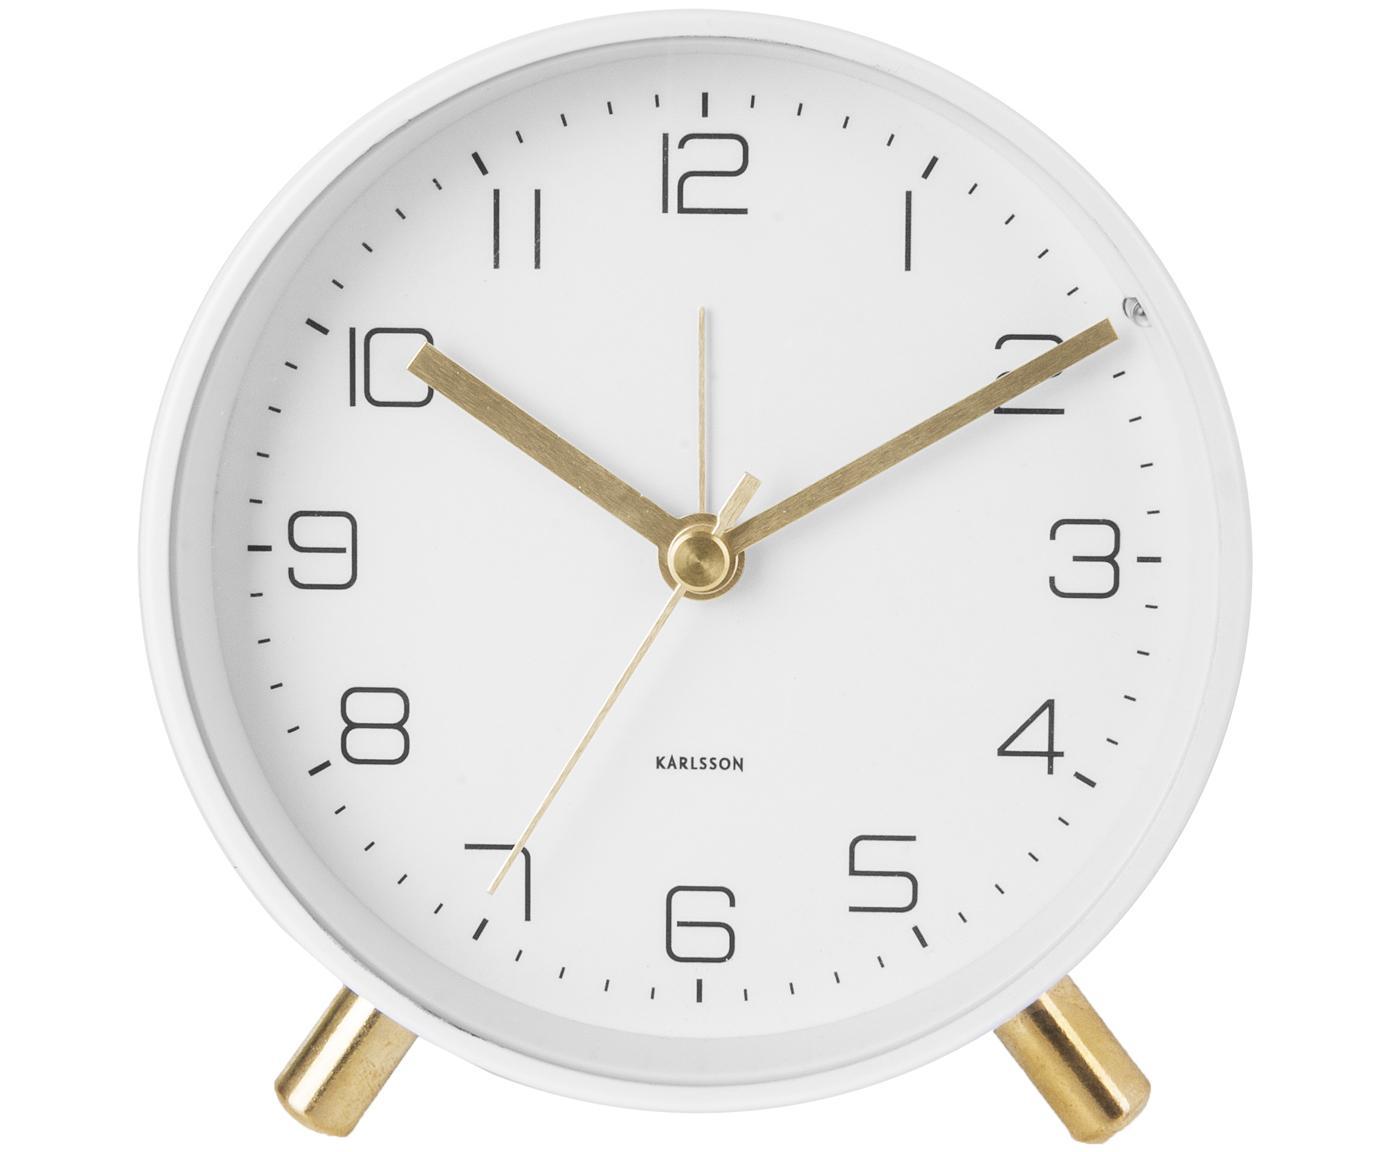 Wecker Lofty, Metall, lackiert, Weiß, Ø 11 x T 5 cm